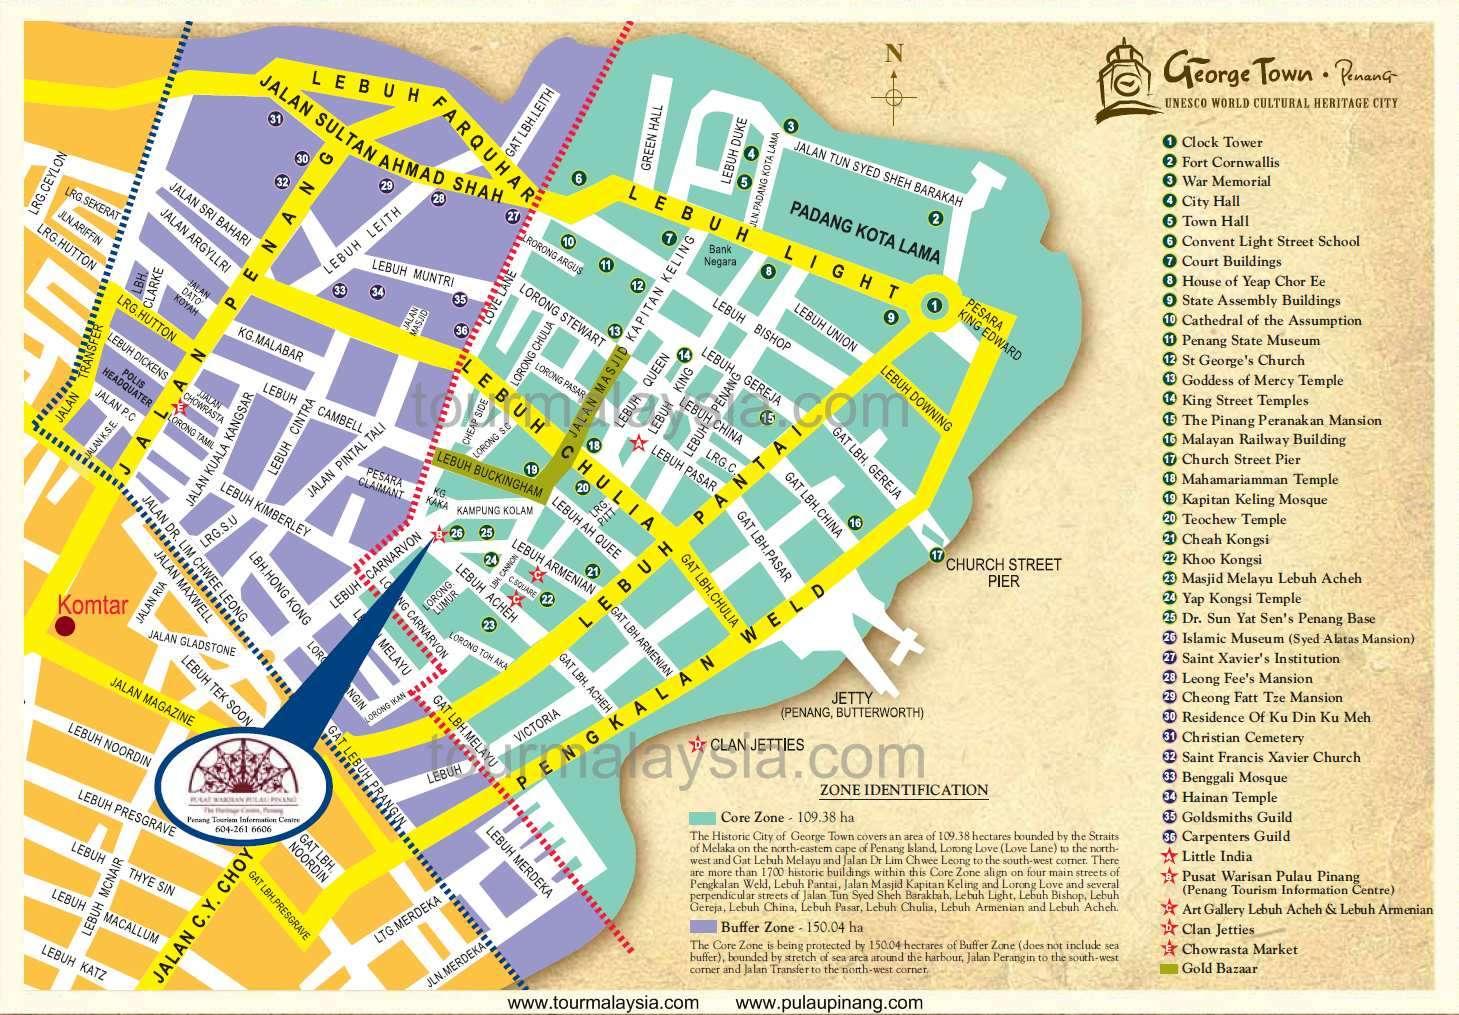 http://3.bp.blogspot.com/-hSoXpu3fOR8/UOUuj8u15_I/AAAAAAAAAOI/mpYPEBWK_Hg/s1600/penang-heritage-city-map.jpeg